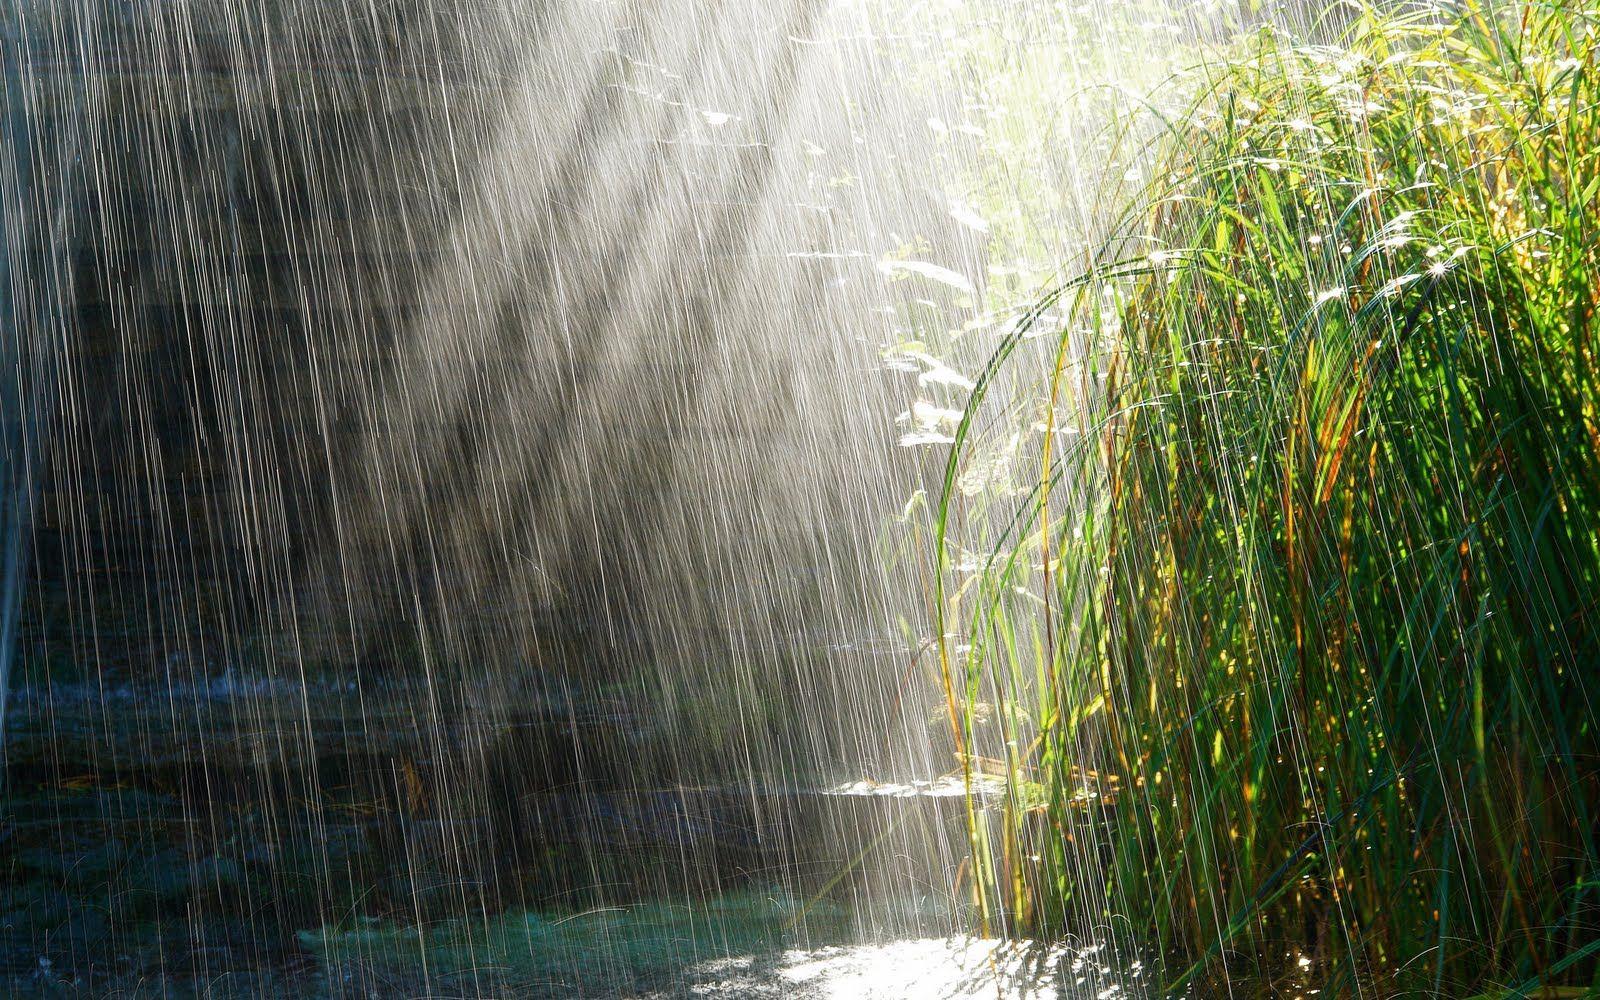 Beautiful Rainy Season On Grass Wallpaper Hd Wallpaper